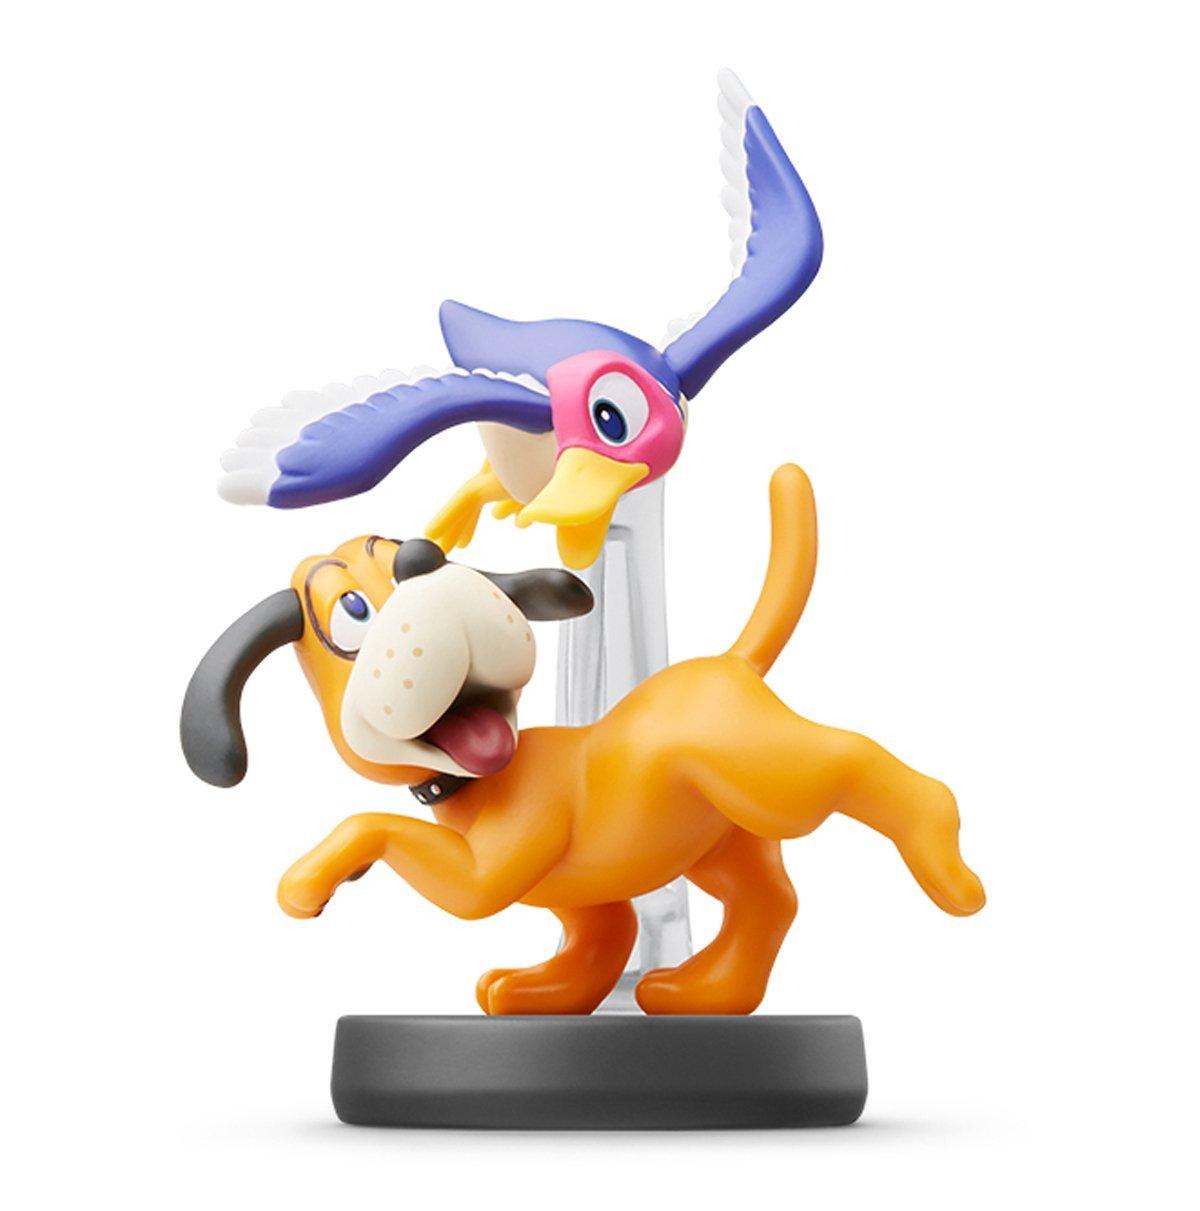 Amiibo 打鴨子 鴨子獵人 任天堂明星大亂鬥 互動 Wii U/New3DS/New3DS LL 公仔